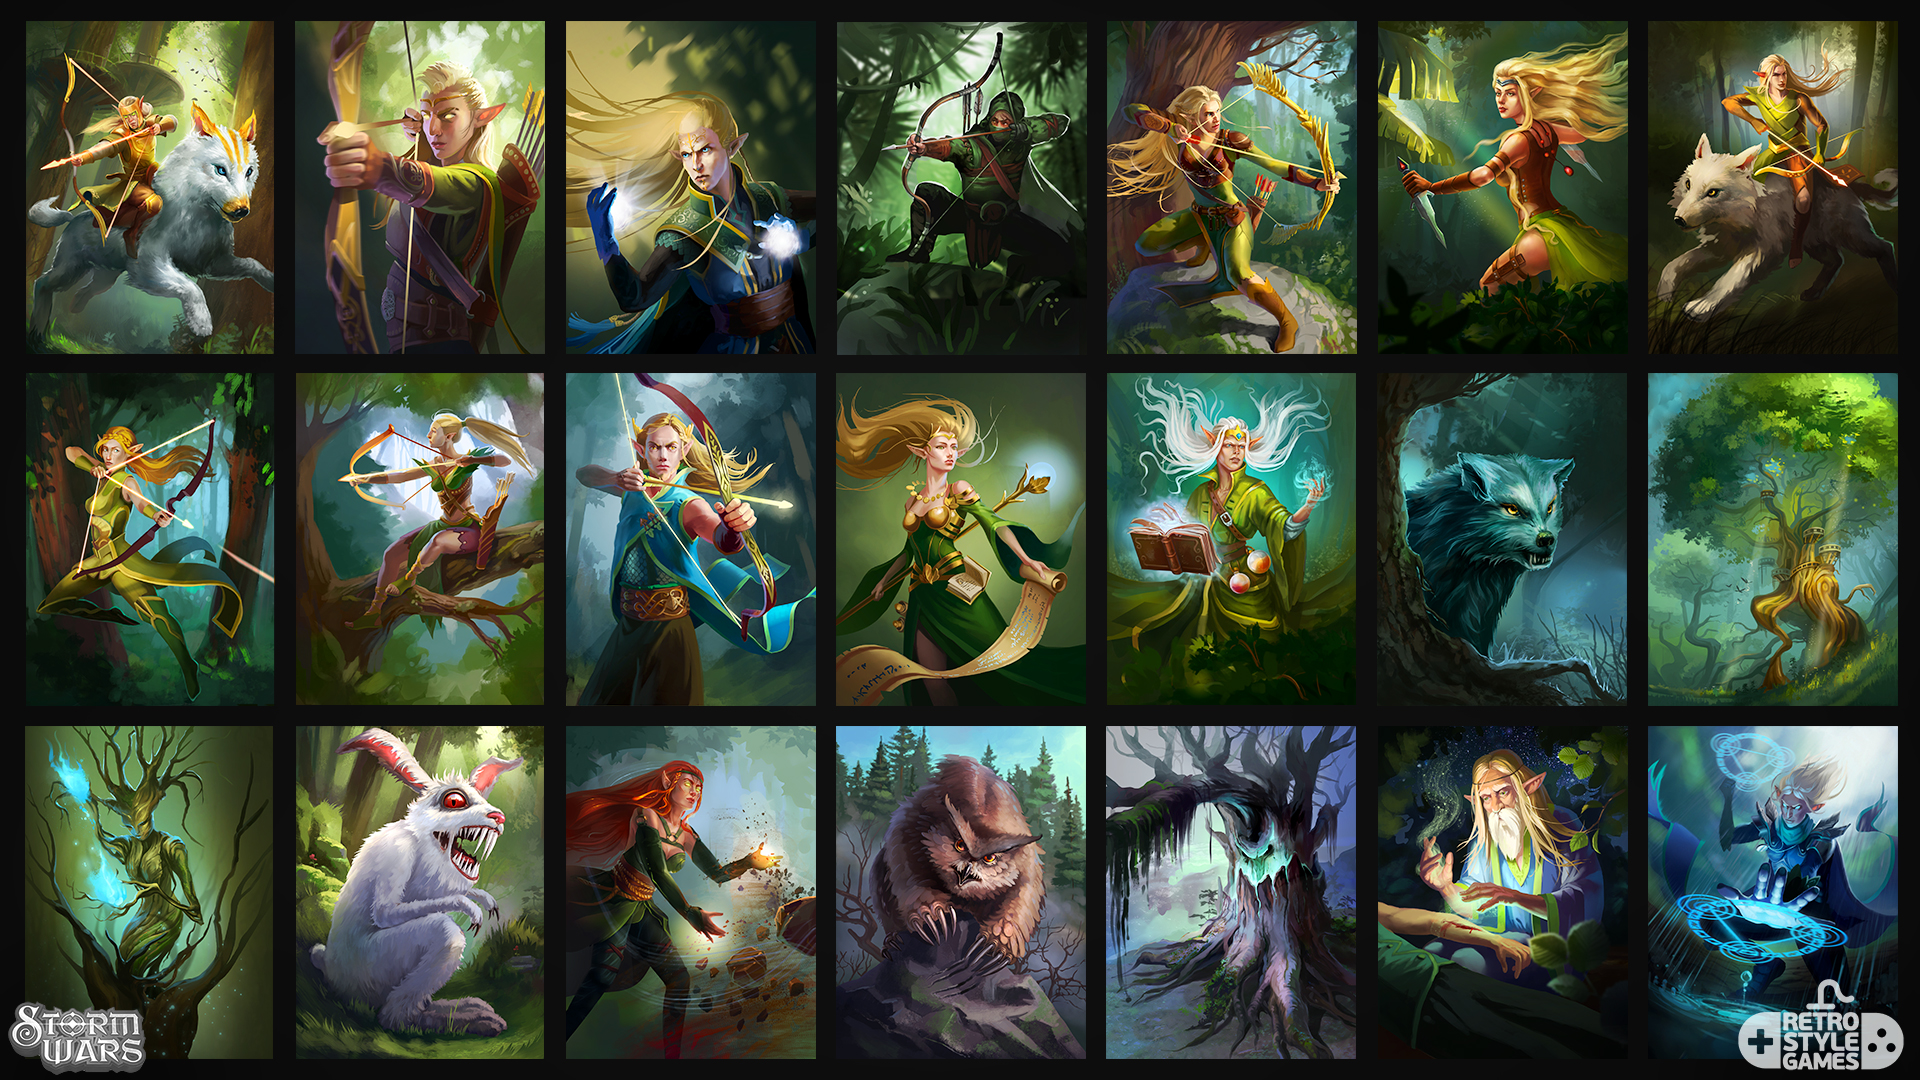 stormwars 2d high elves elf character illustrations set